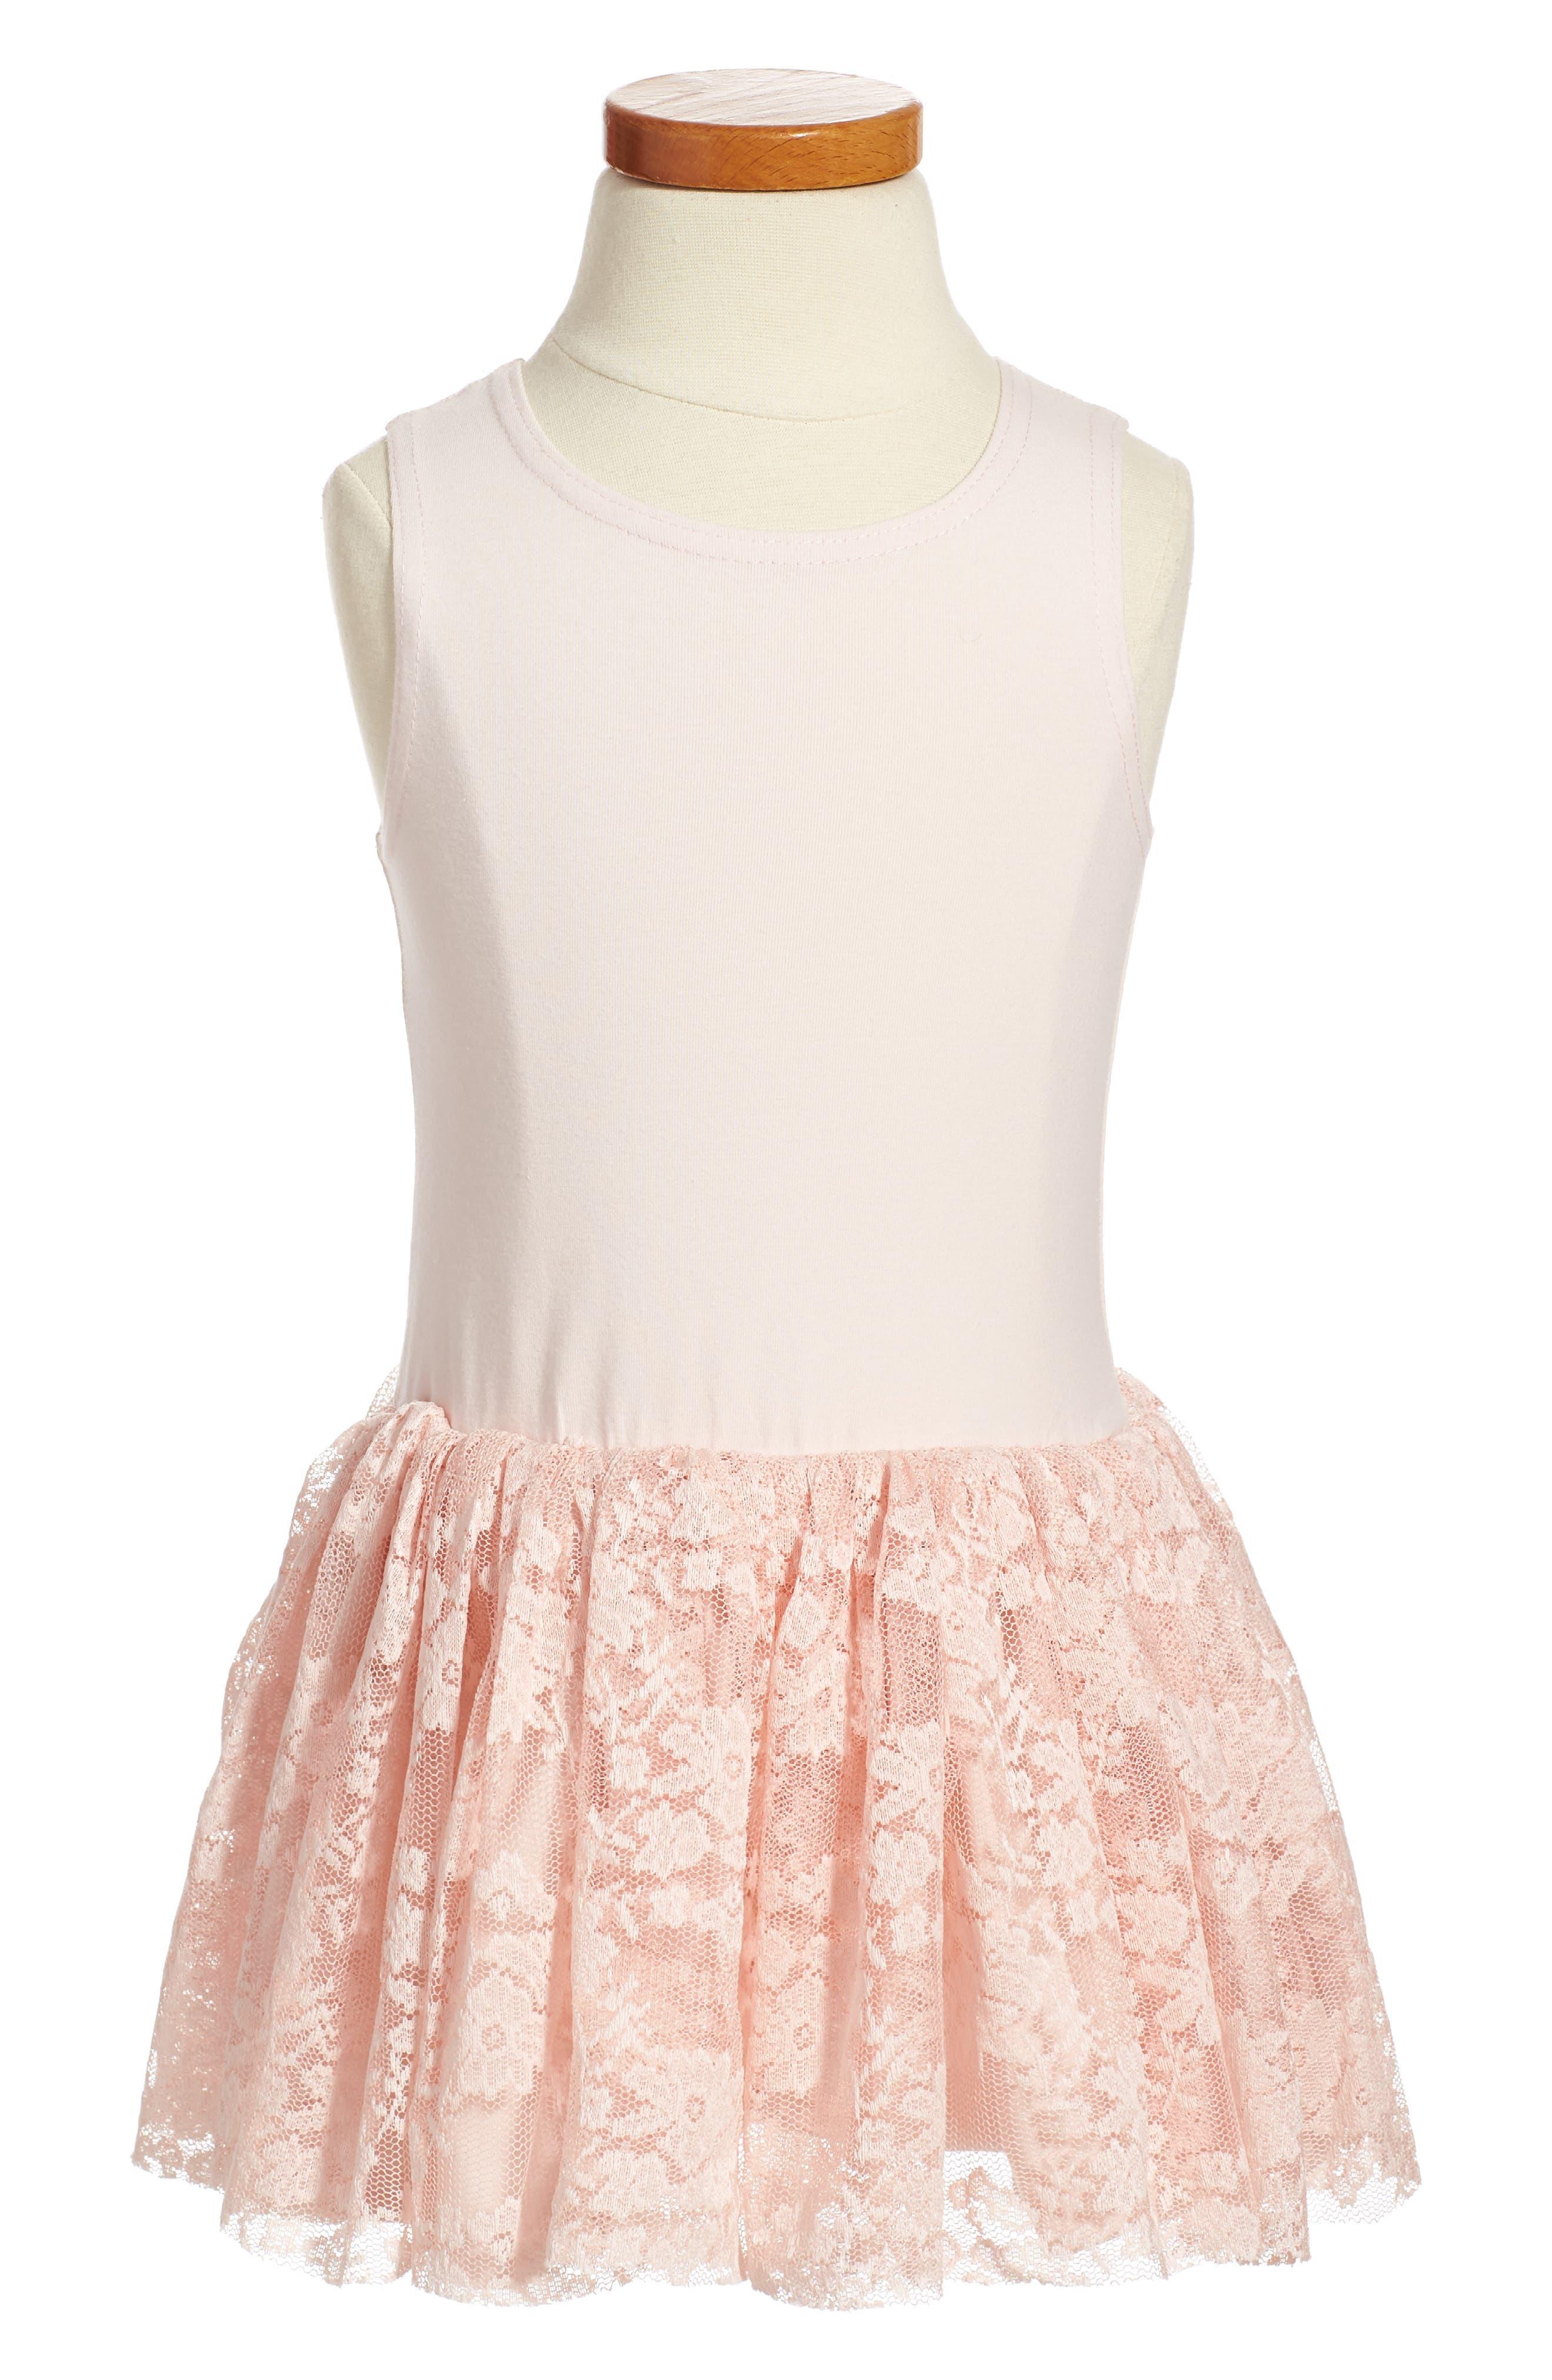 Alternate Image 3  - Pippa & Julie Sweater & Lace Skirt Dress (Toddler Girls, Little Girls & Big Girls)